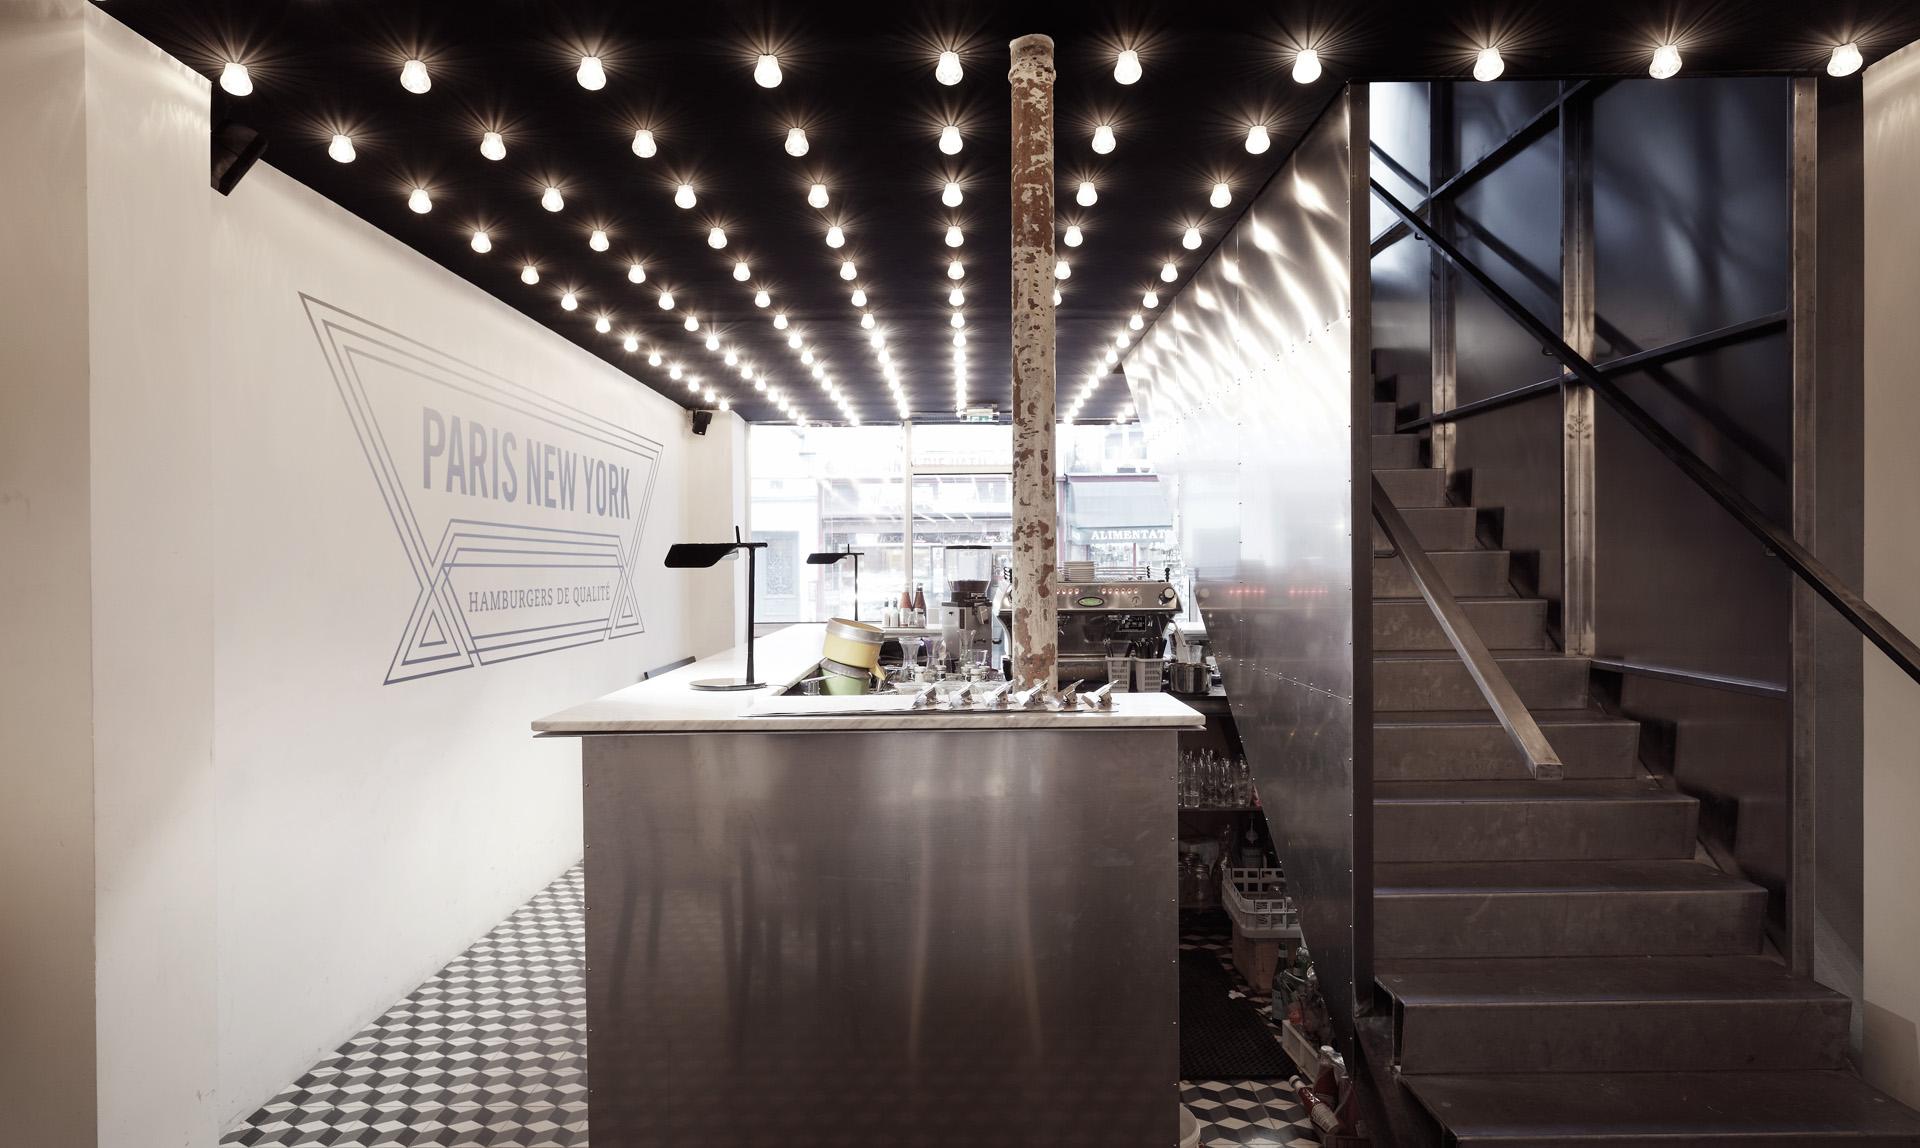 PNY-005-Cut architectures ©David_Foessel.jpg